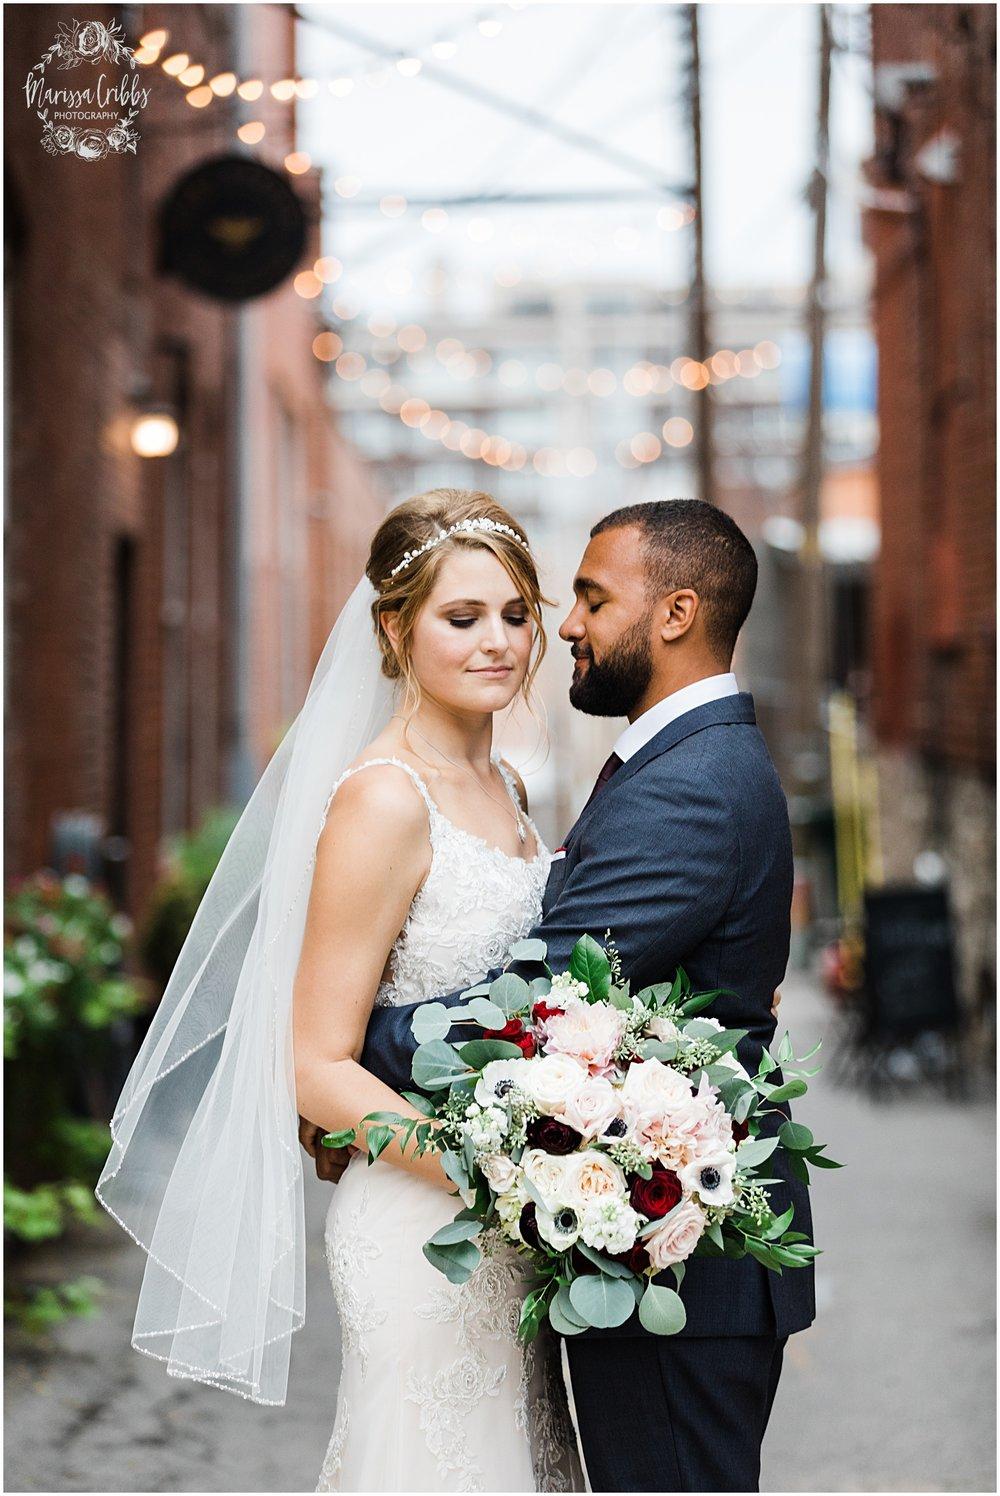 BAUER WEDDING | KELSEA & JUSTIN | MARISSA CRIBBS PHOTOGRAPHY_6566.jpg